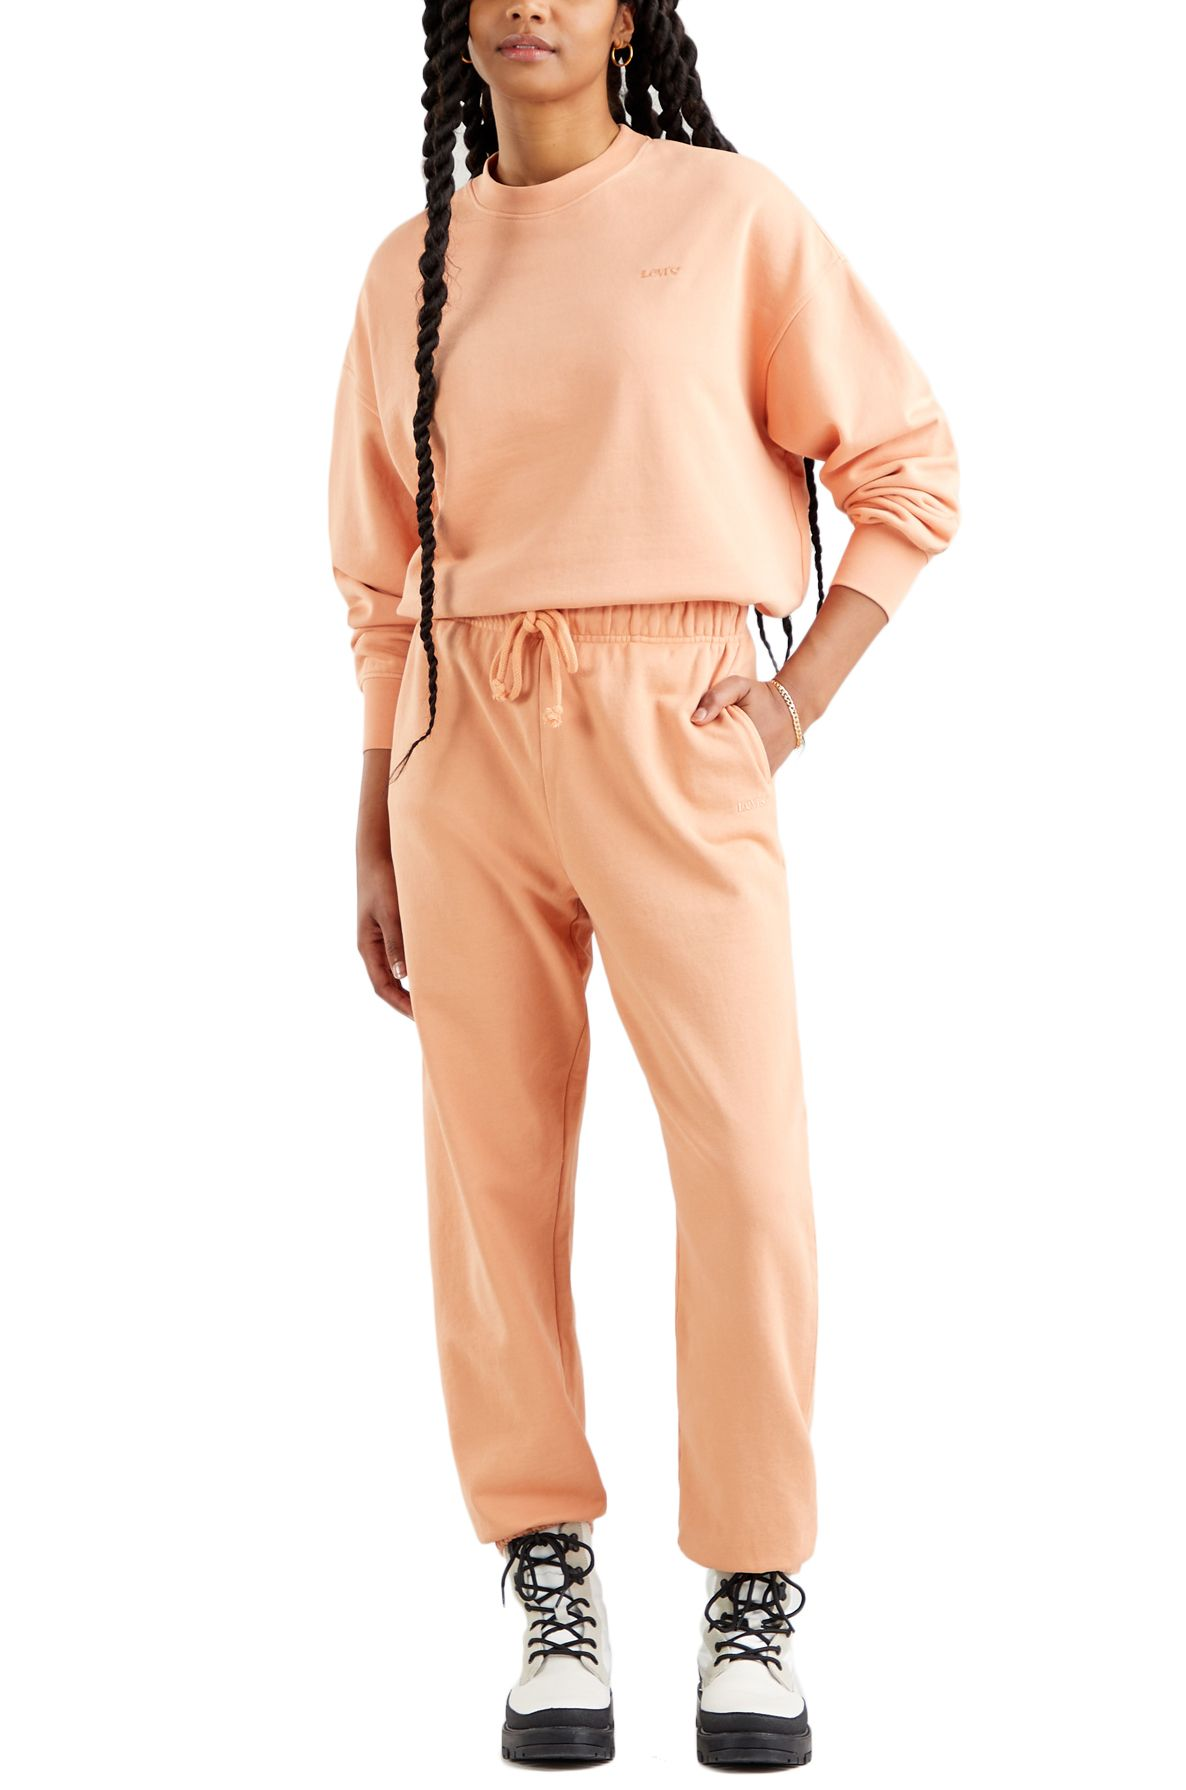 Levis Pants WFH SWEATPANTS Garment Dye Fa166116 Peach Bloom